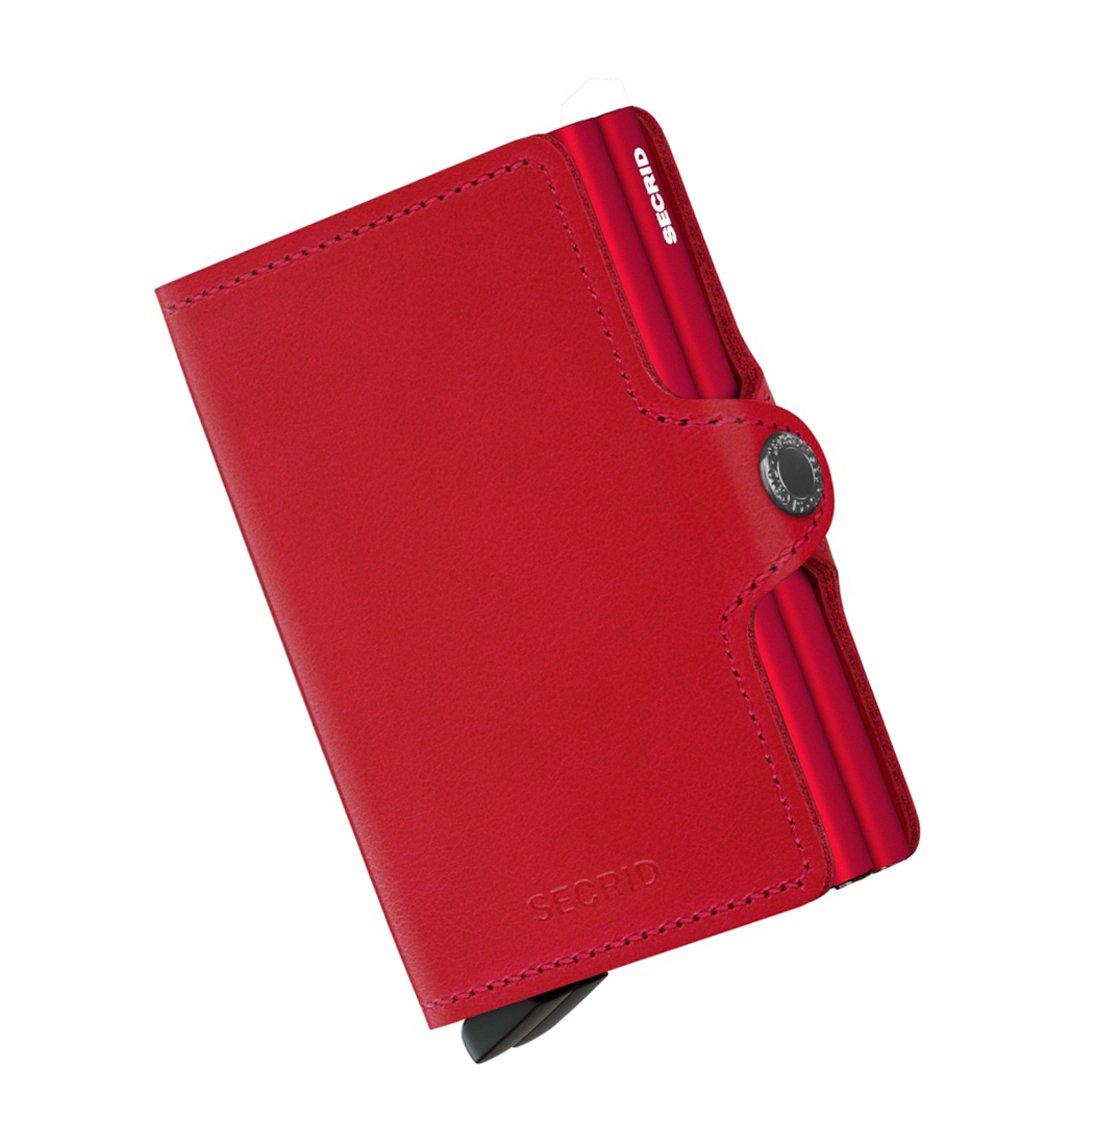 Secrid Twinwallet Red Red Wallet SC6004